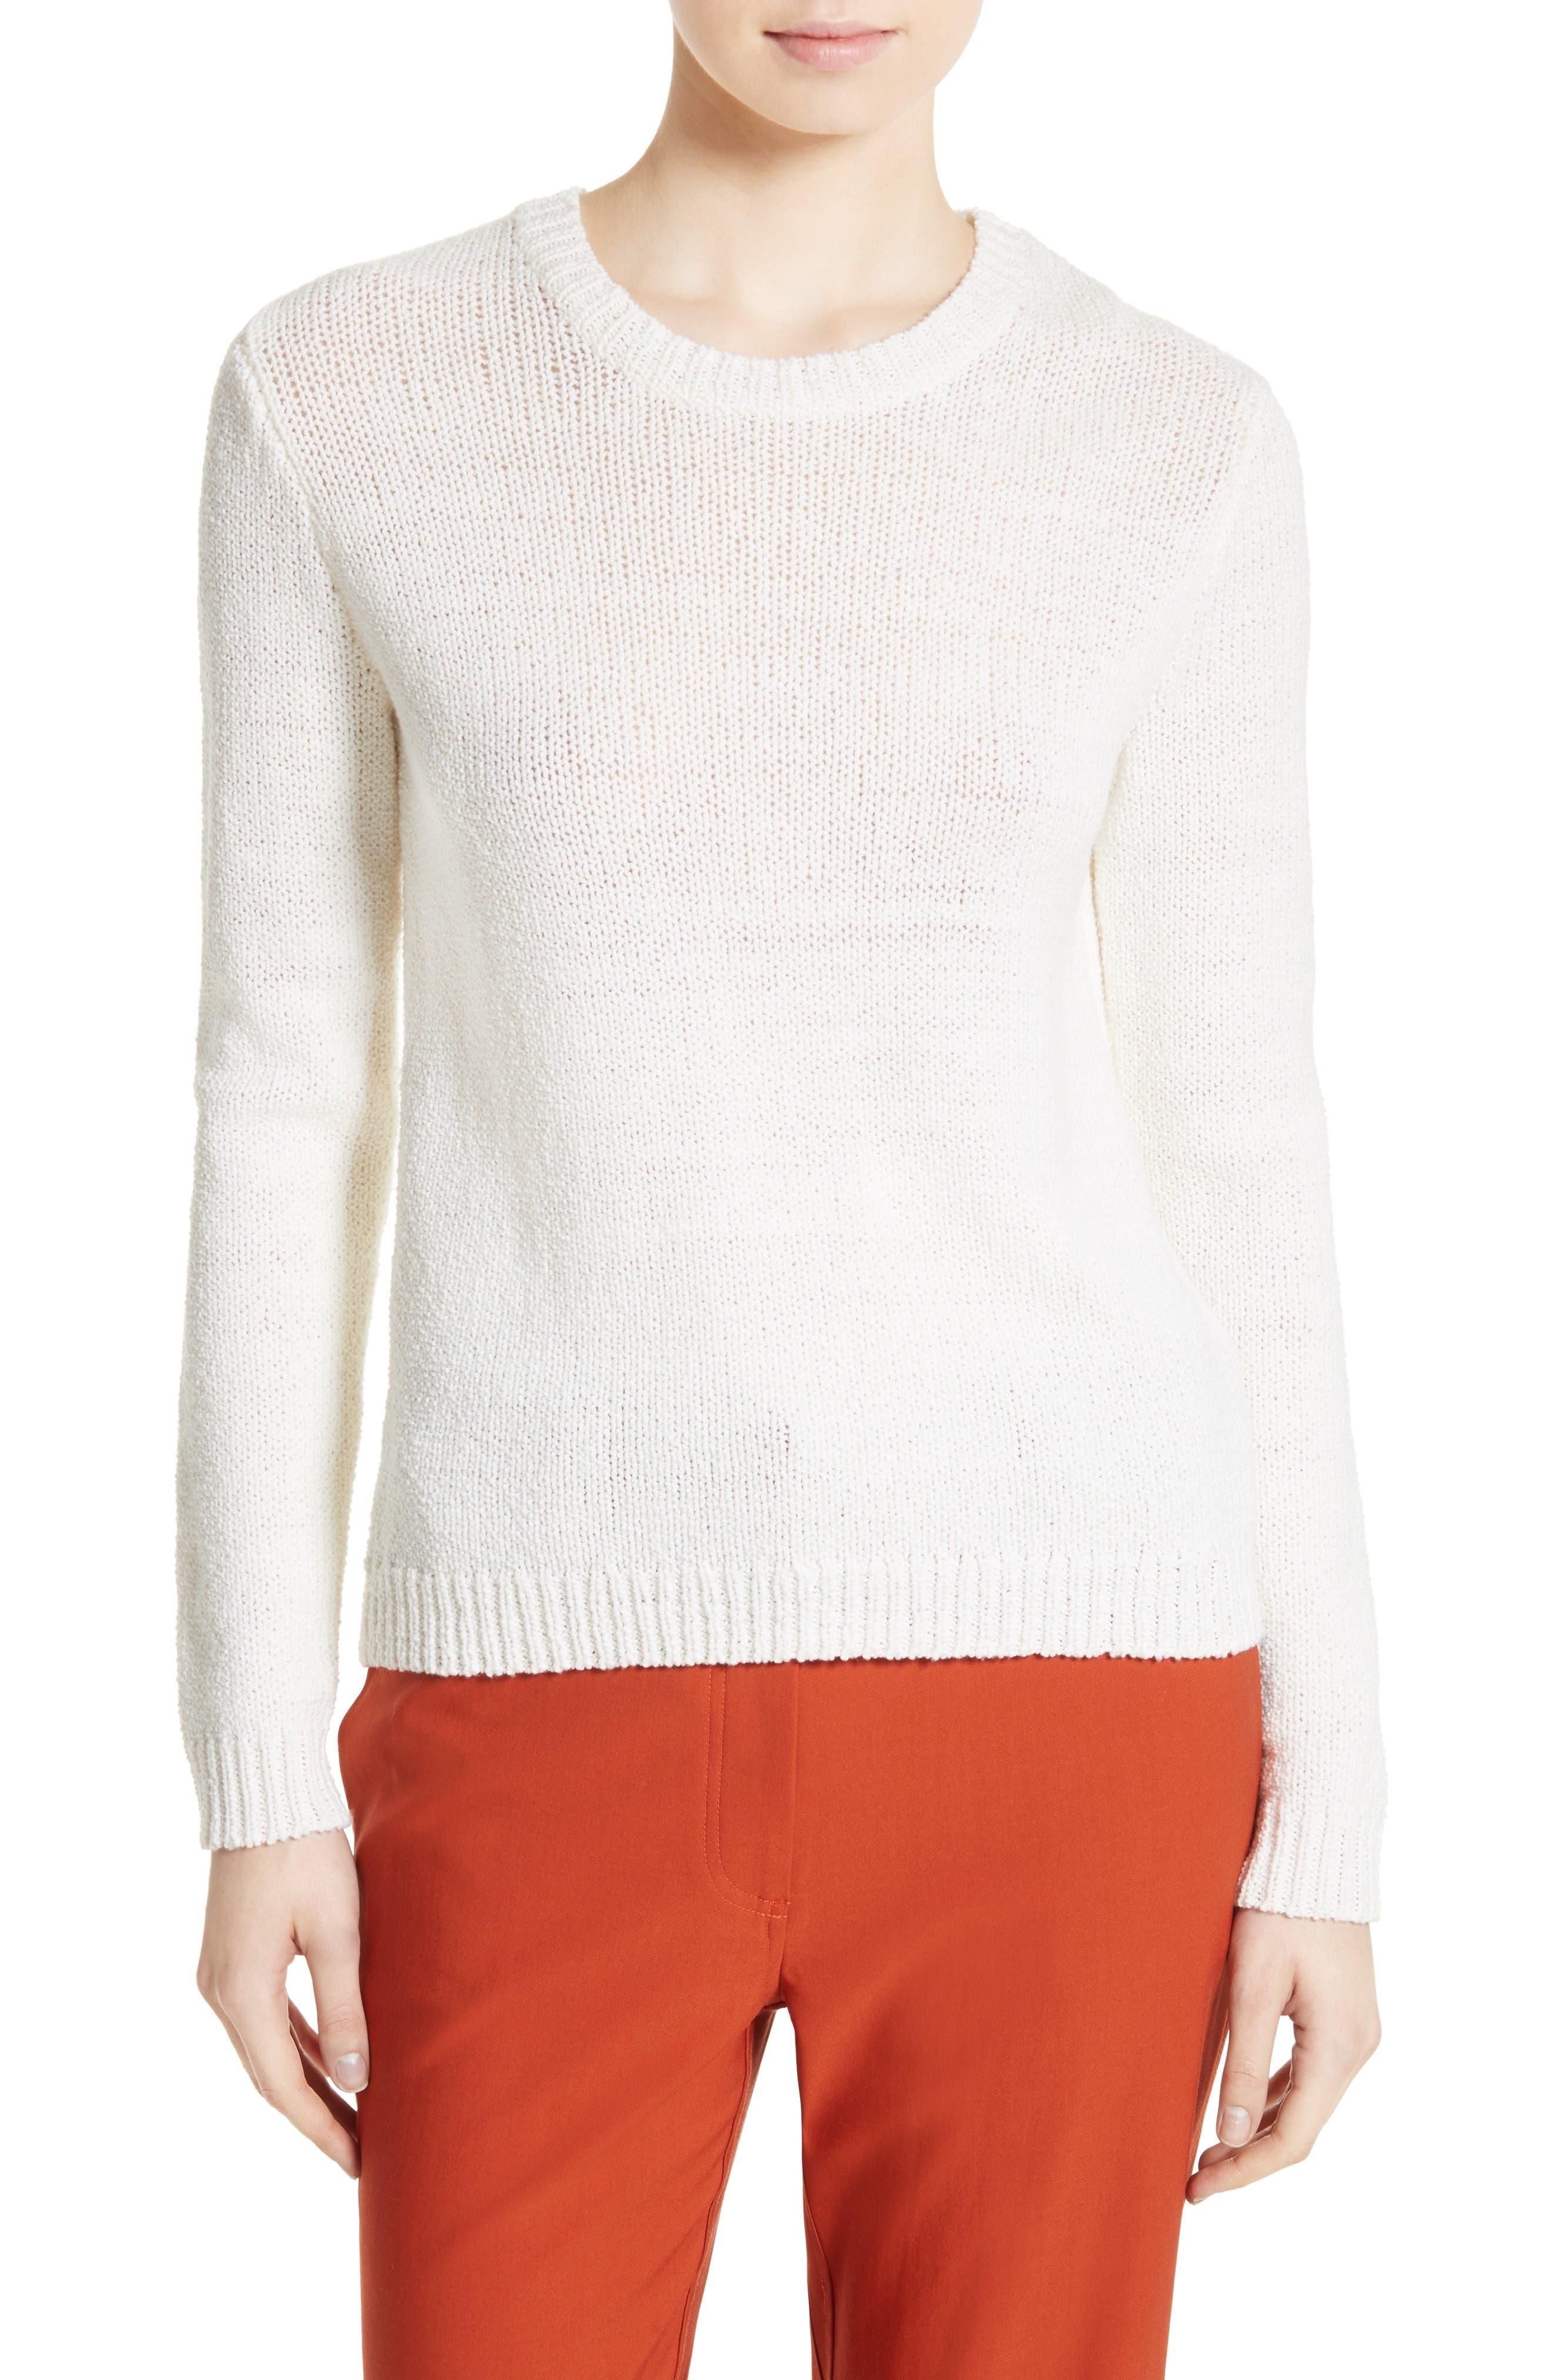 THEORY Yulia Summer Bouclé Merino Wool Sweater